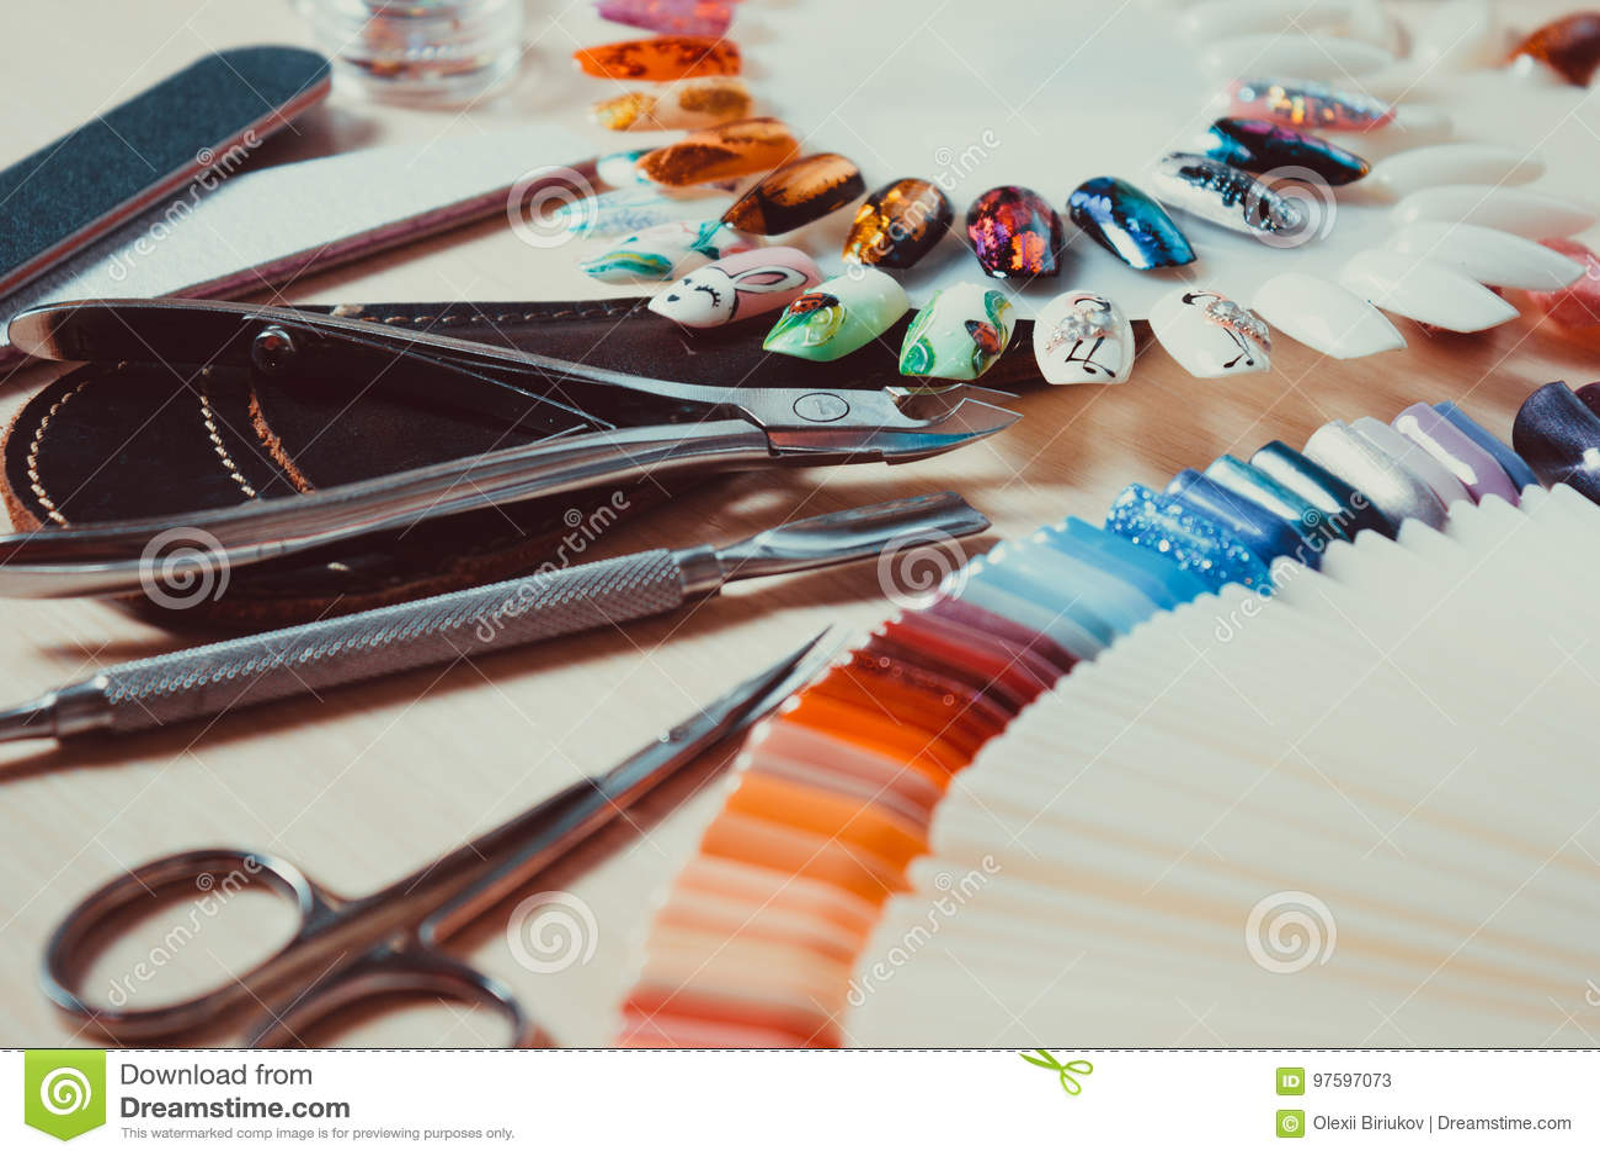 Sticker pour table et bureau mains avec manucure rose tulipe tenue